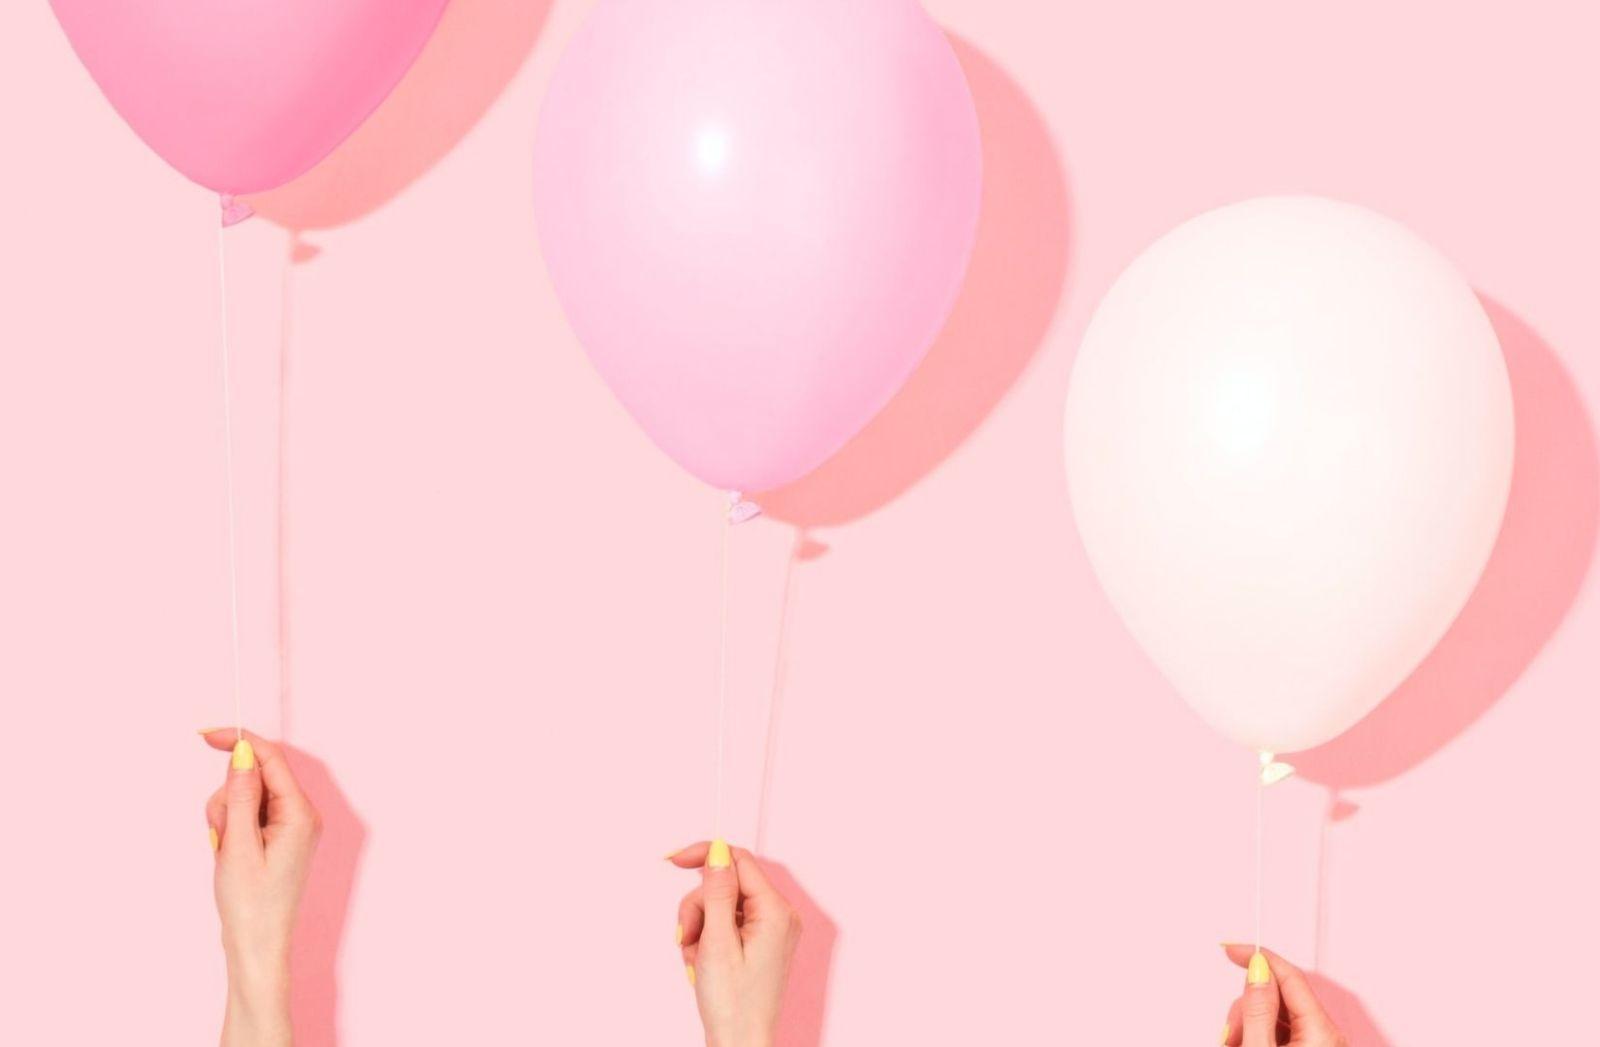 Luftballons. (Foto: Amy Shamblen, Unsplash.com)